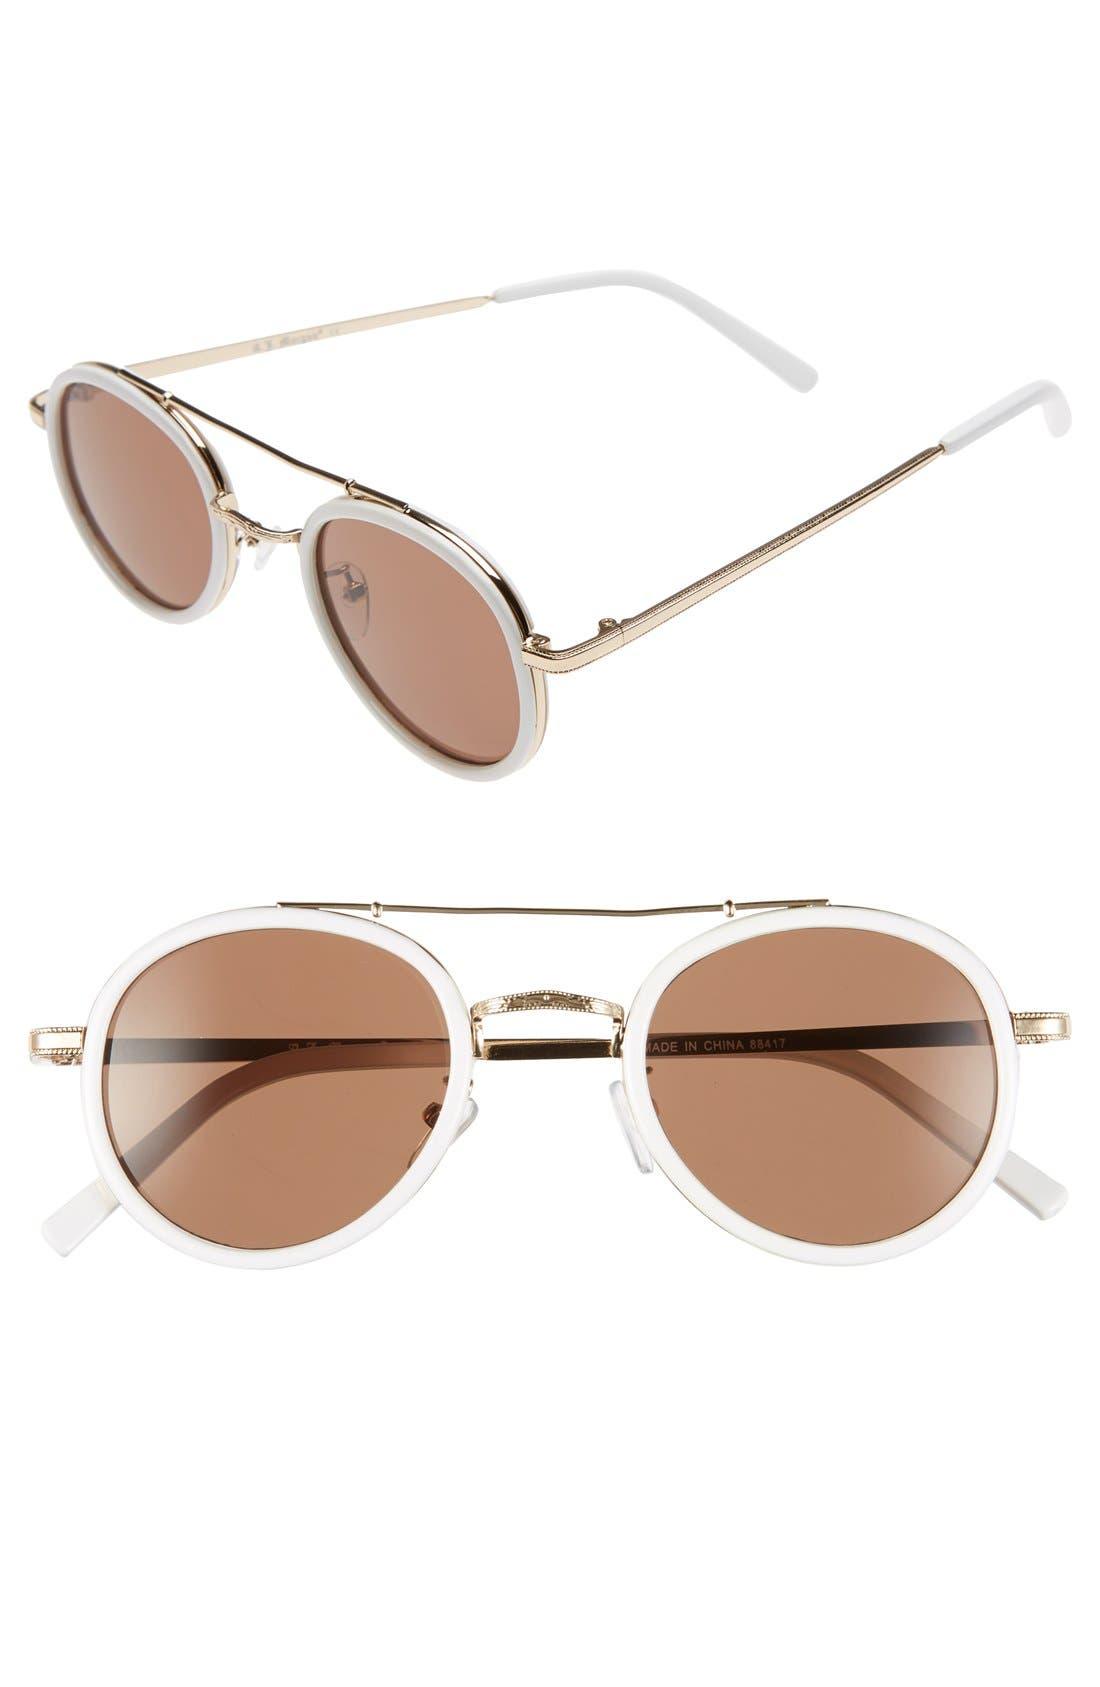 Alternate Image 1 Selected - A.J. Morgan 'Cocktail' 47mm Sunglasses